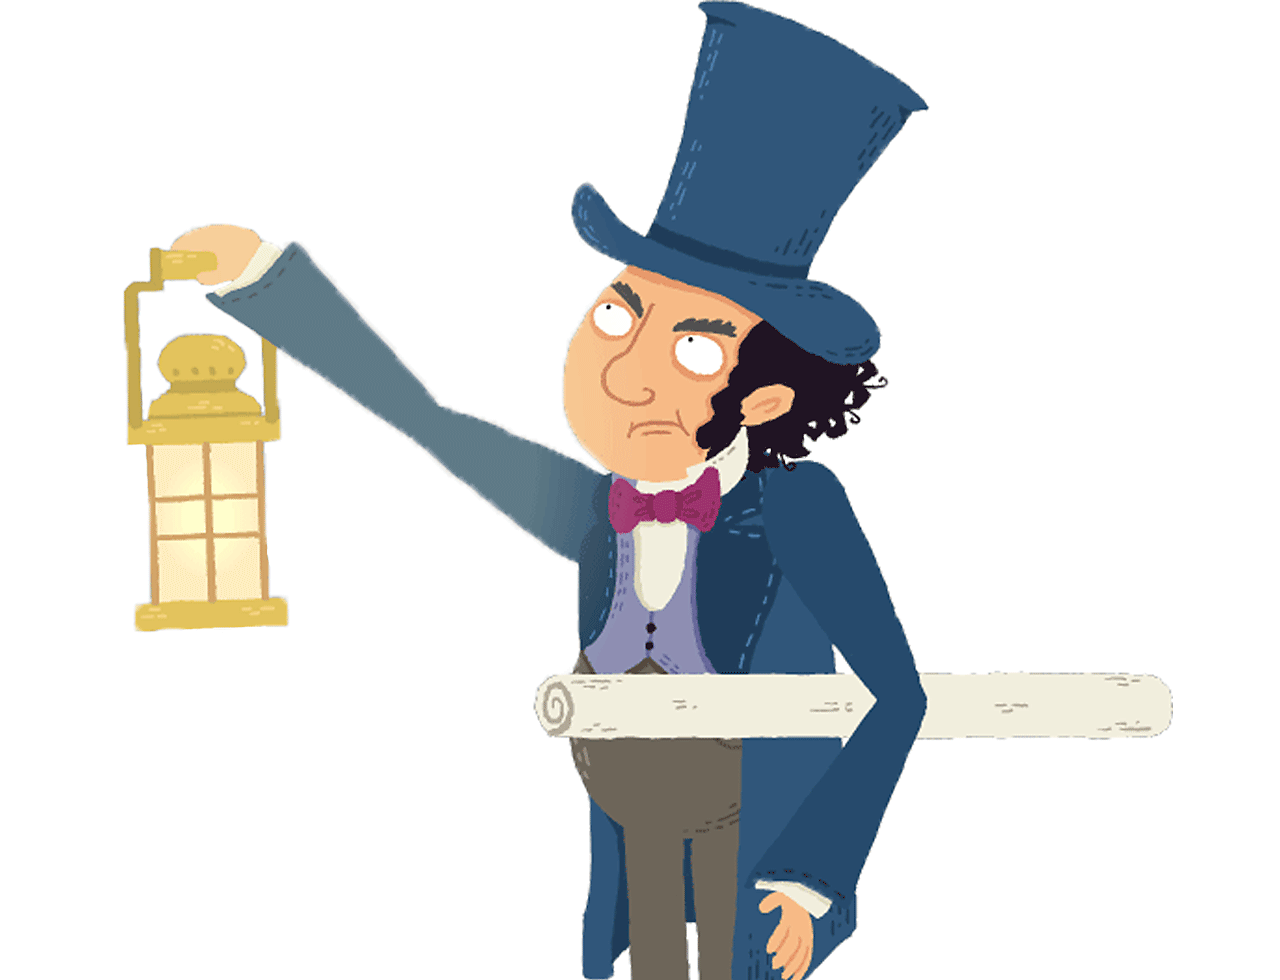 Isambard Kingdom Brunel holding a lamp.